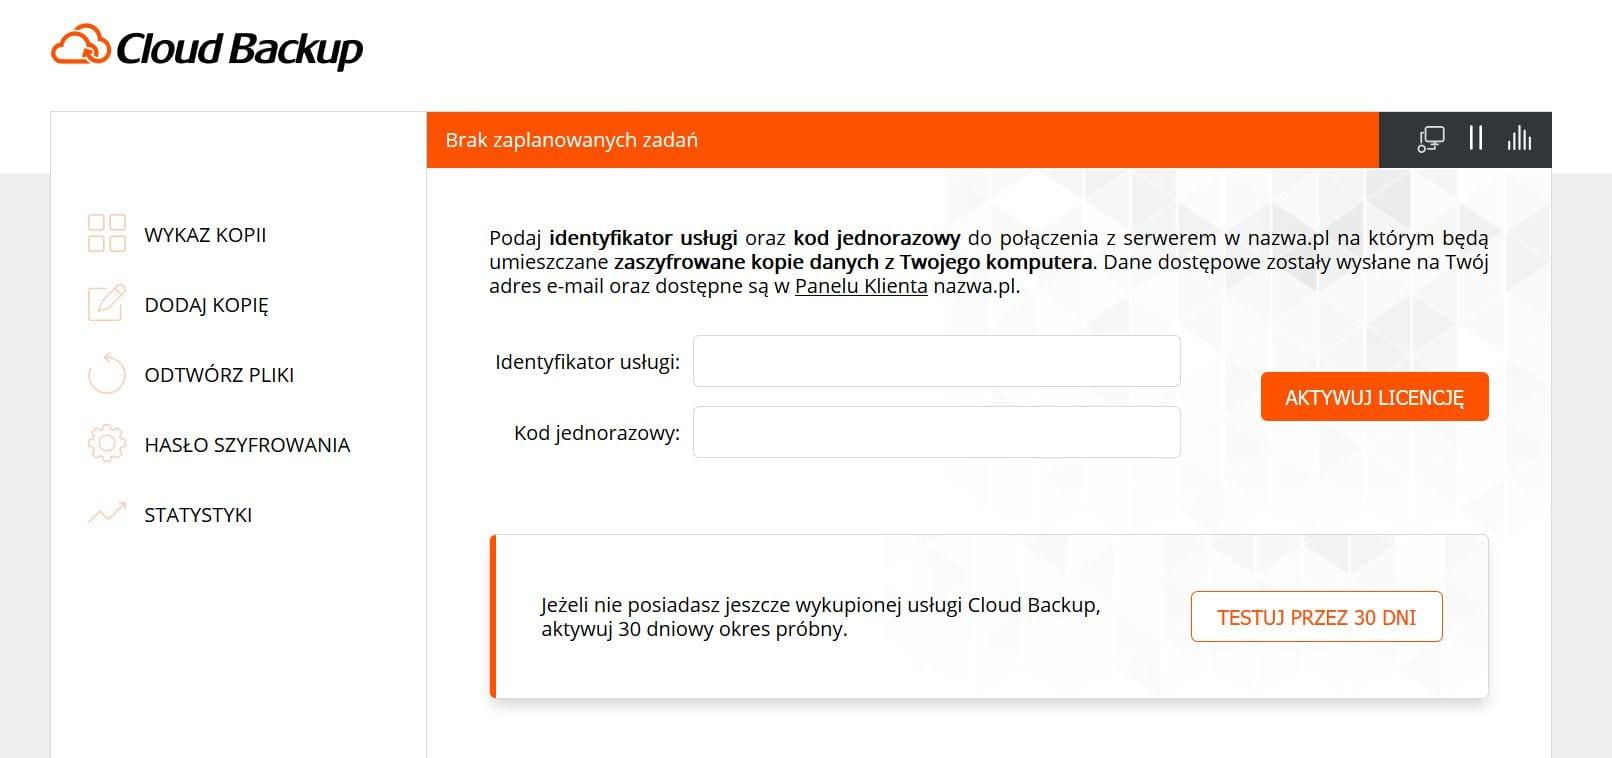 Podgląd programu Cloud Backup odnazwa.pl